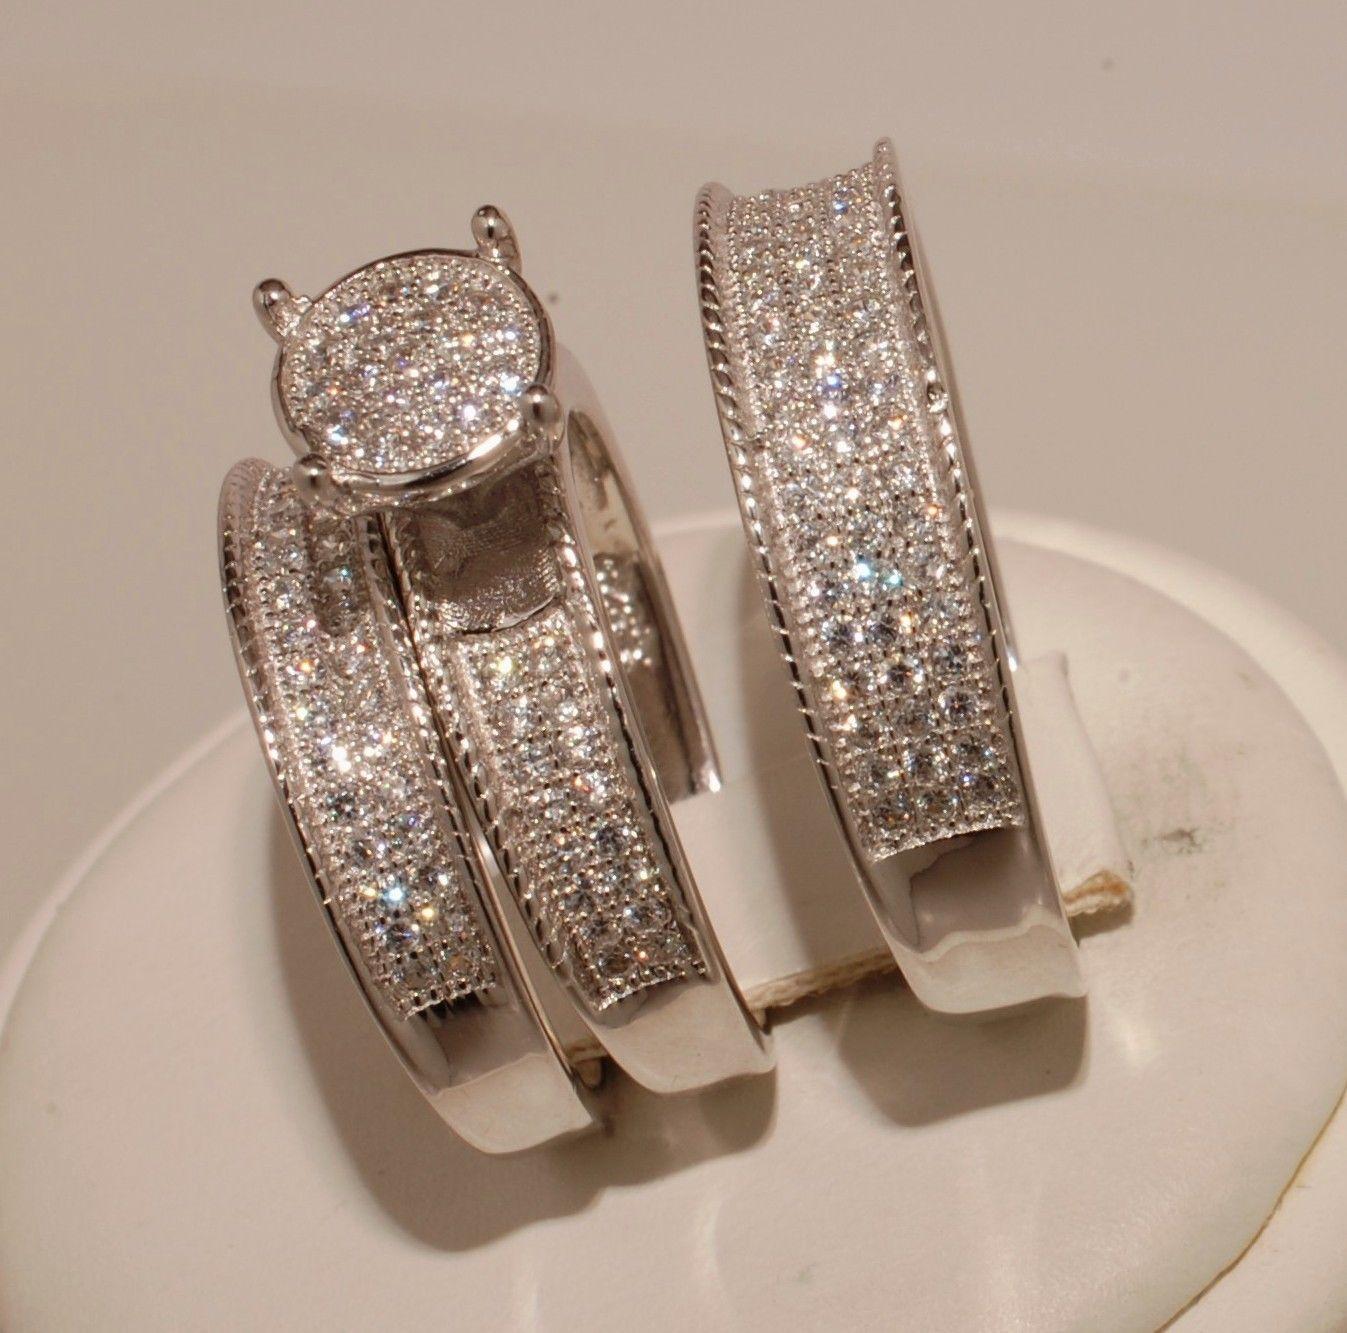 His Her Matching Engagement Wedding Band Ring Diamond Trio Set 14K White Gold Fn